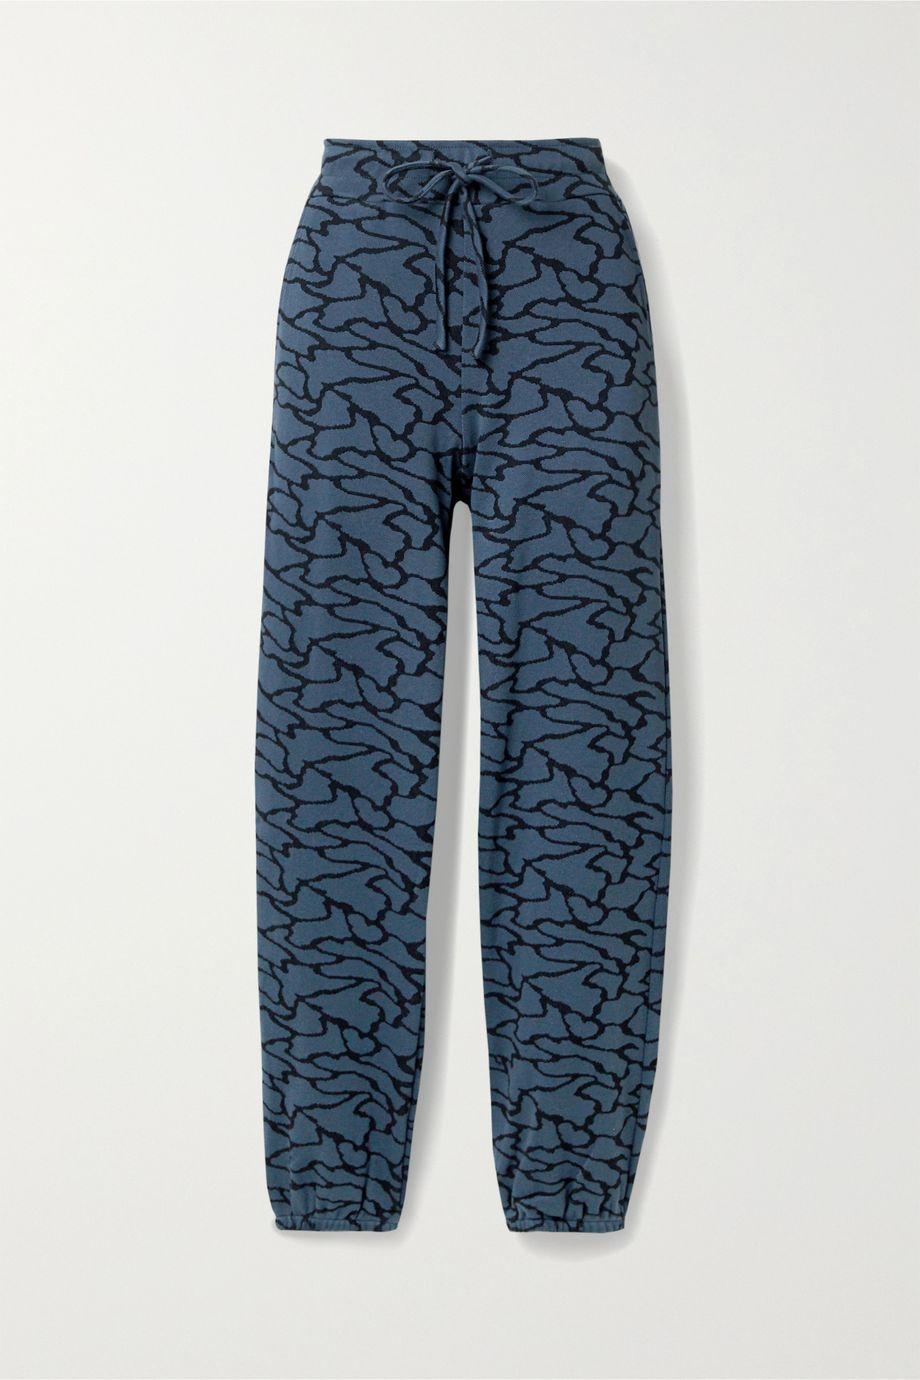 TWENTY Montréal Hyper Reality cotton-blend jacquard-knit track pants